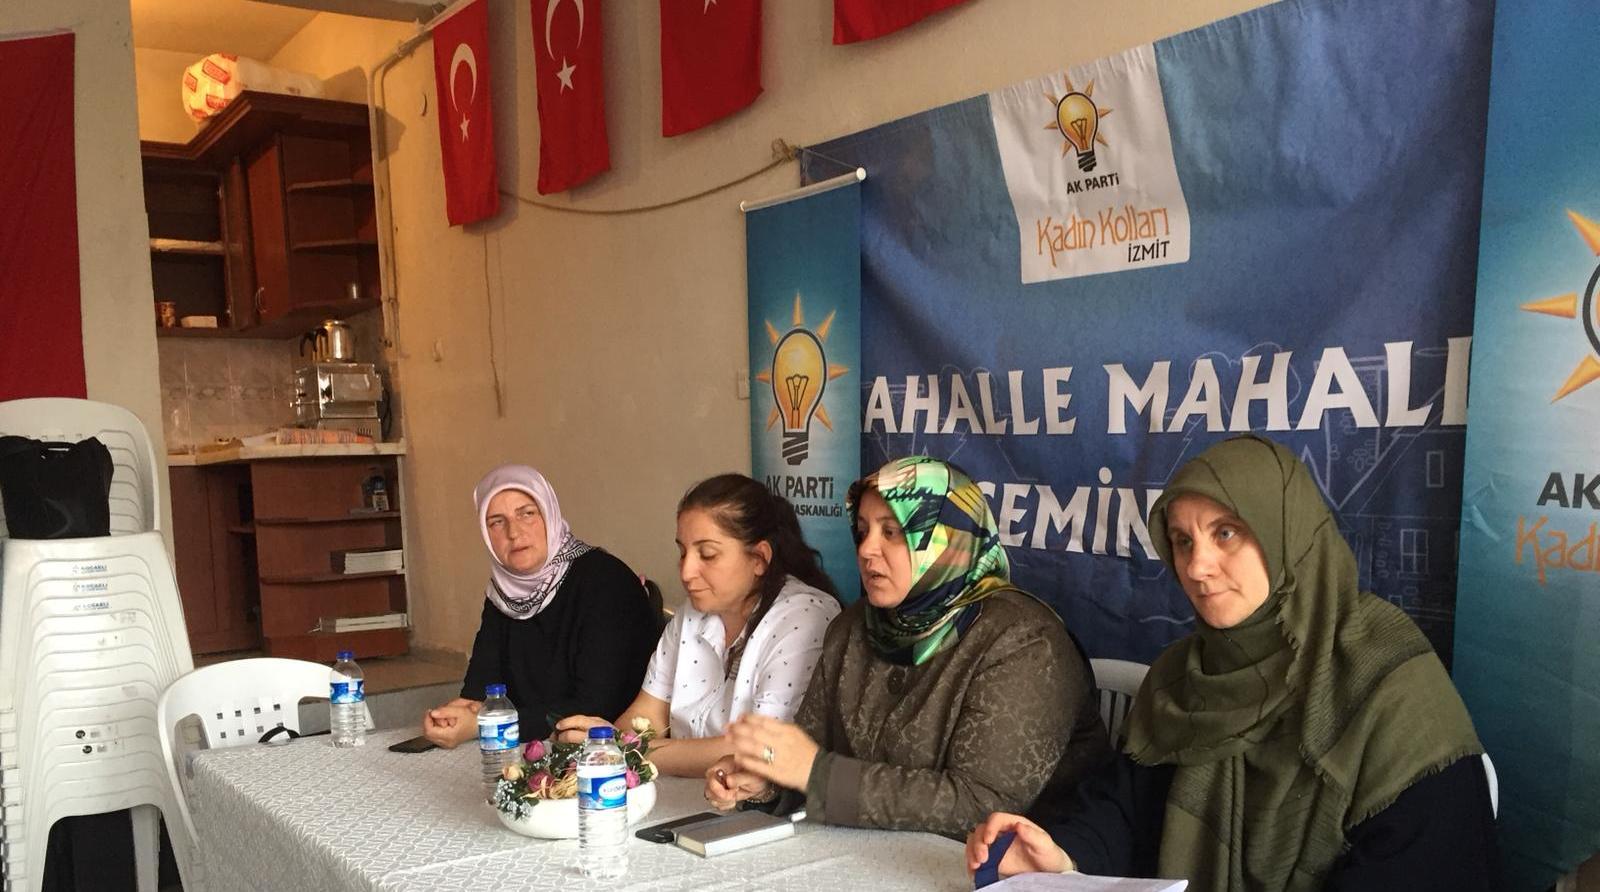 AK kadınlardan mahalle mahalle seminer